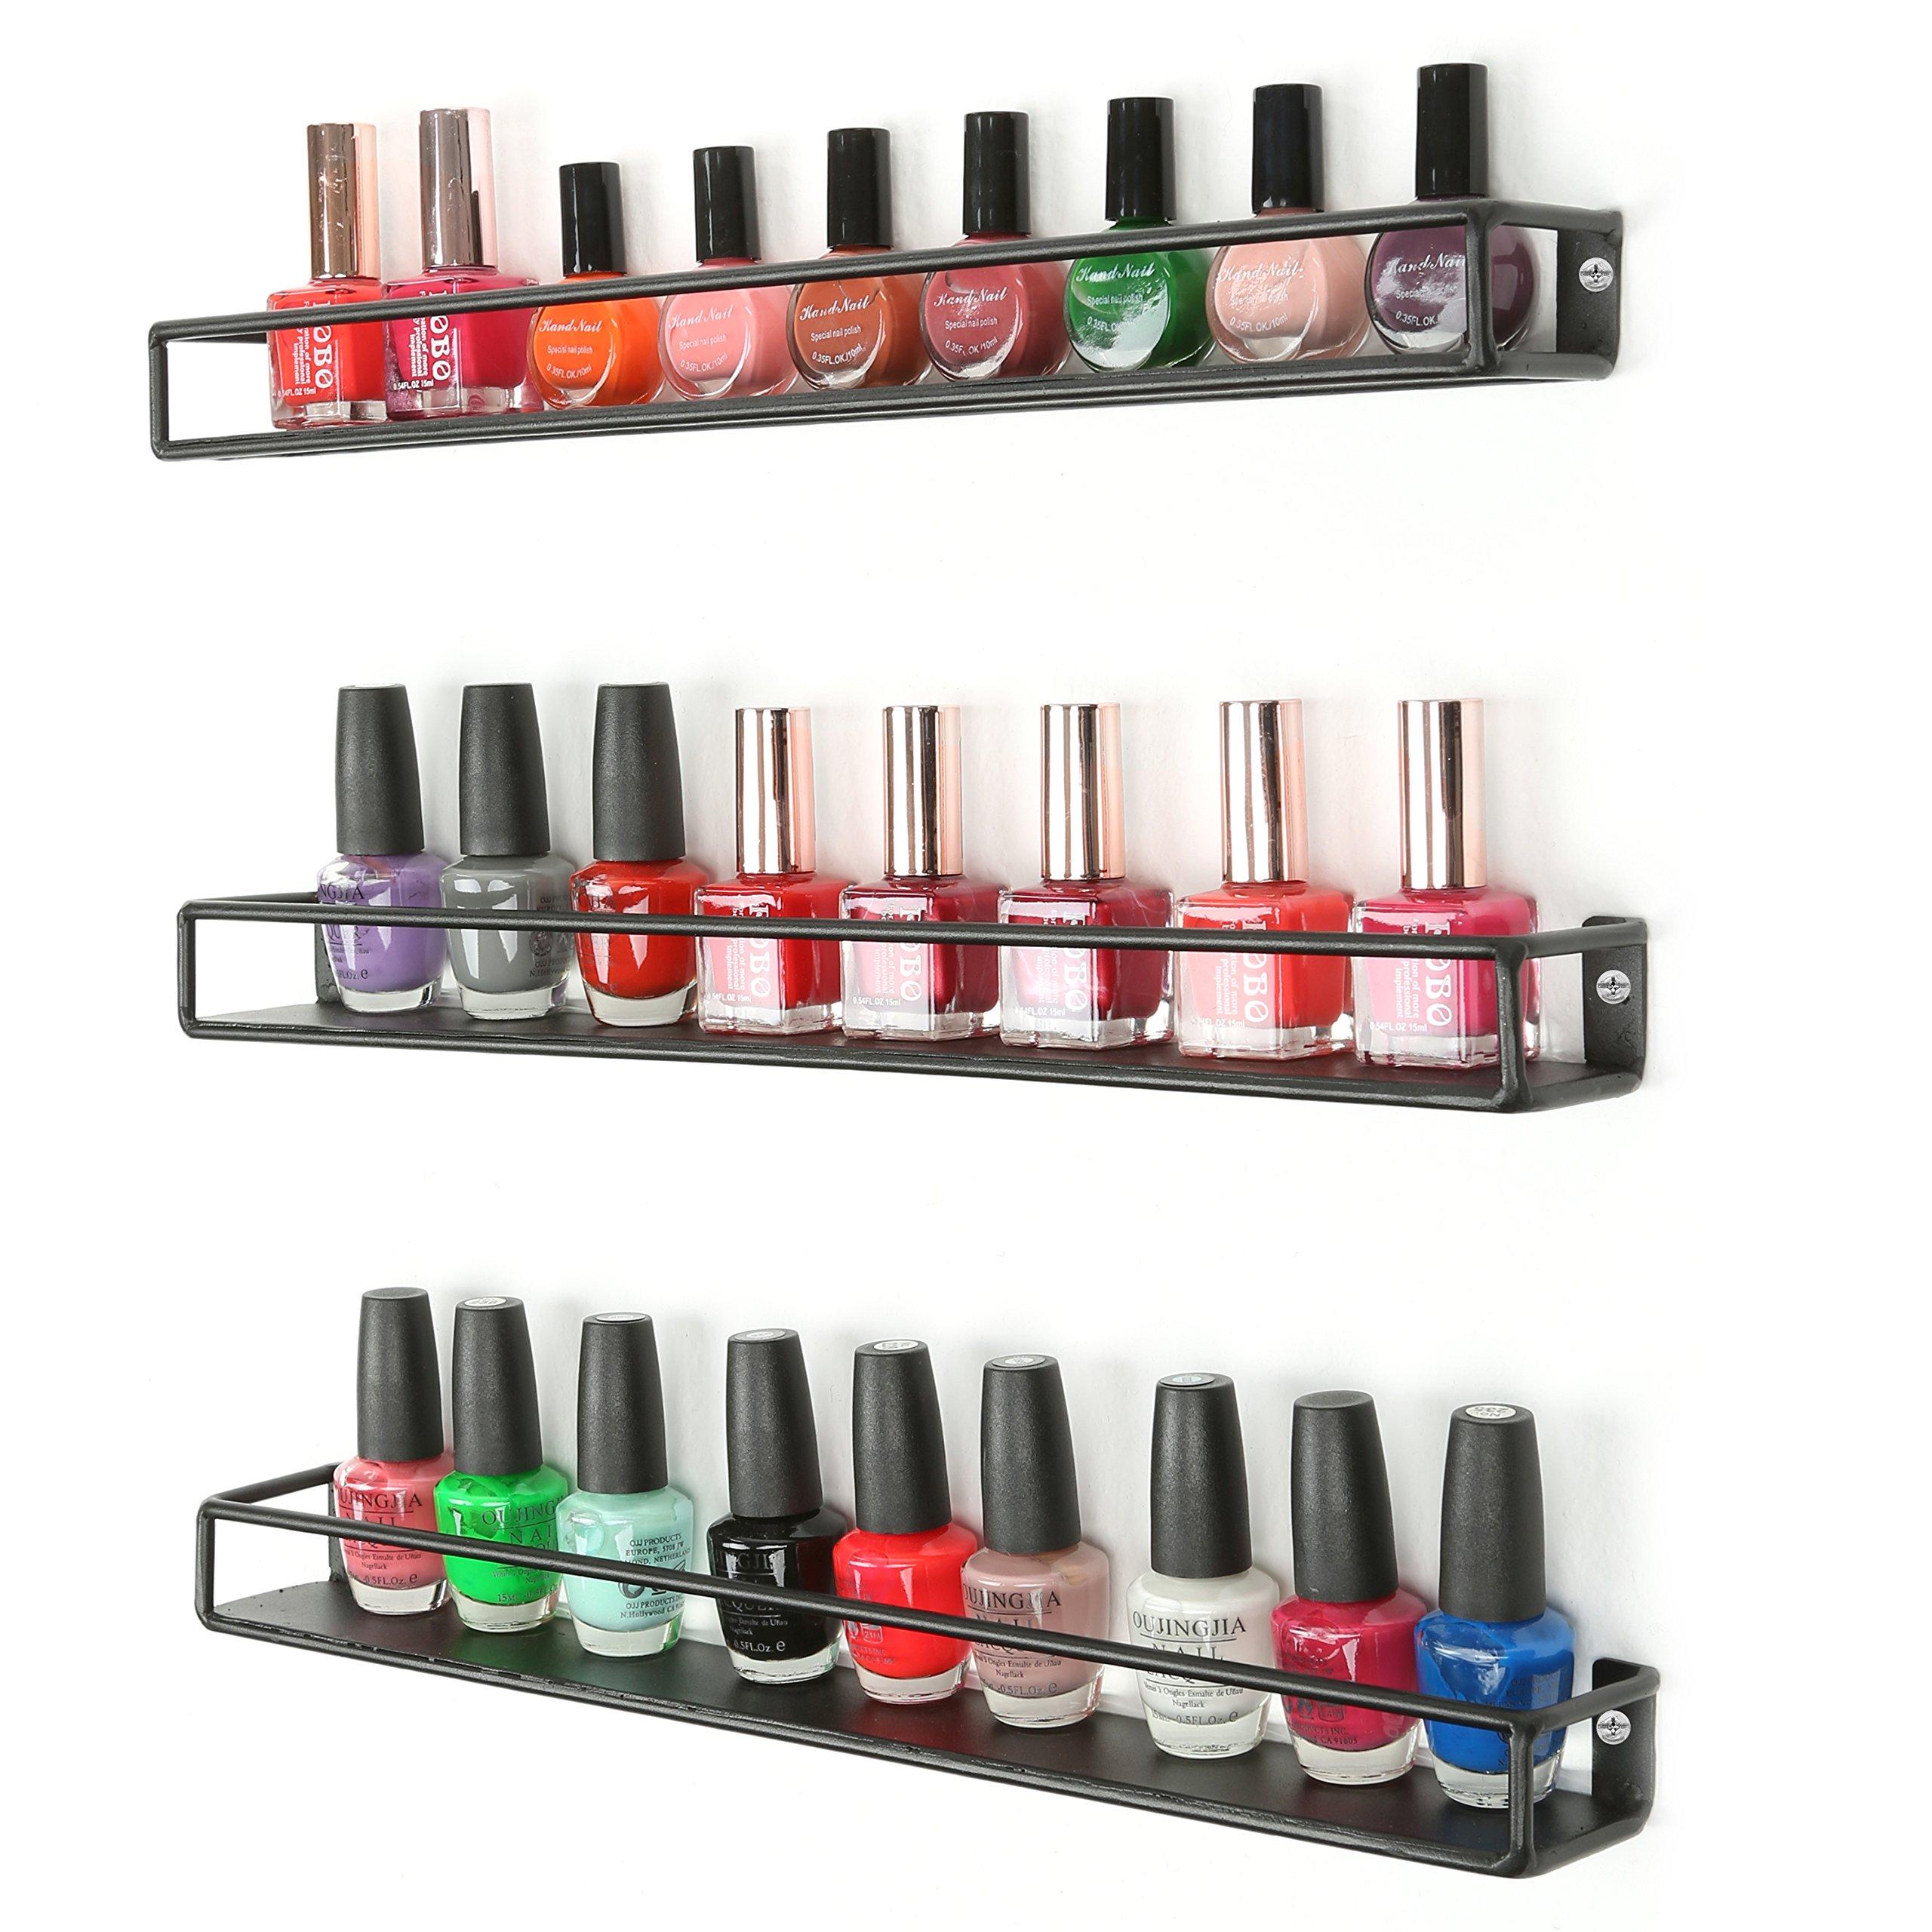 MyGift Set of 3 Black Metal Wall Mounted Nail Polish & Essential Oils Display Shelves/Kitchen Spice Jars Rack